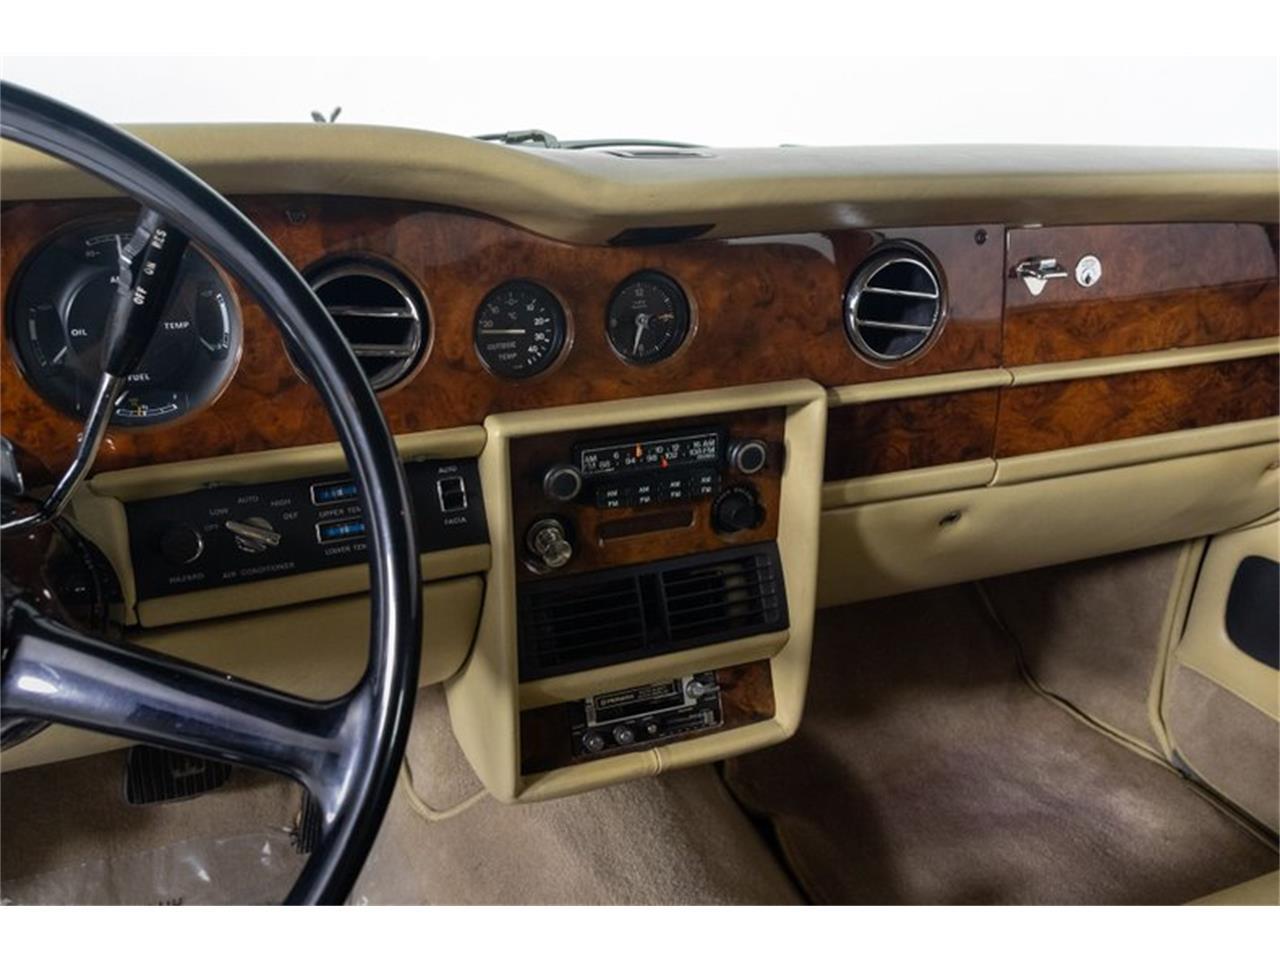 1981 Rolls-Royce Silver Shadow II (CC-1258612) for sale in St. Charles, Missouri